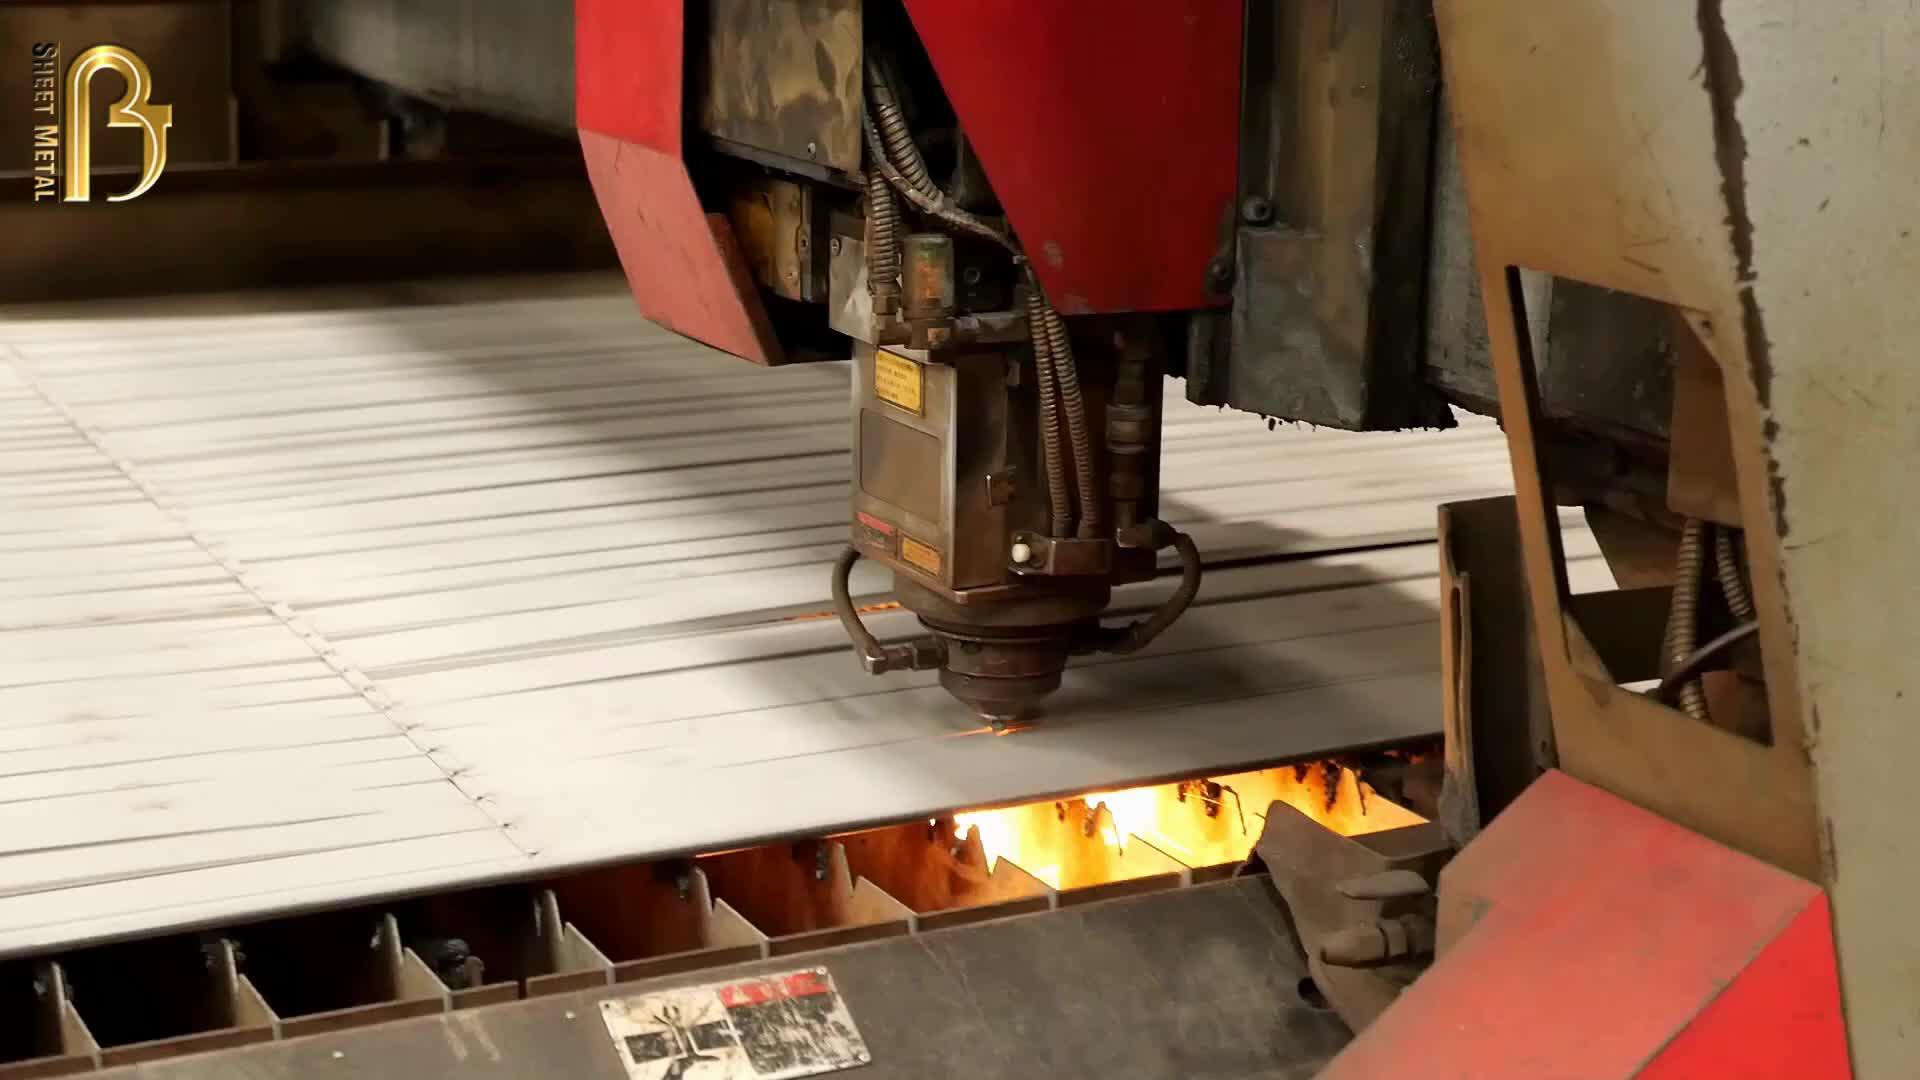 Laser Cutting Service Stainless Steel Art Metal Decor Steel Laser Cutting Wall Decor